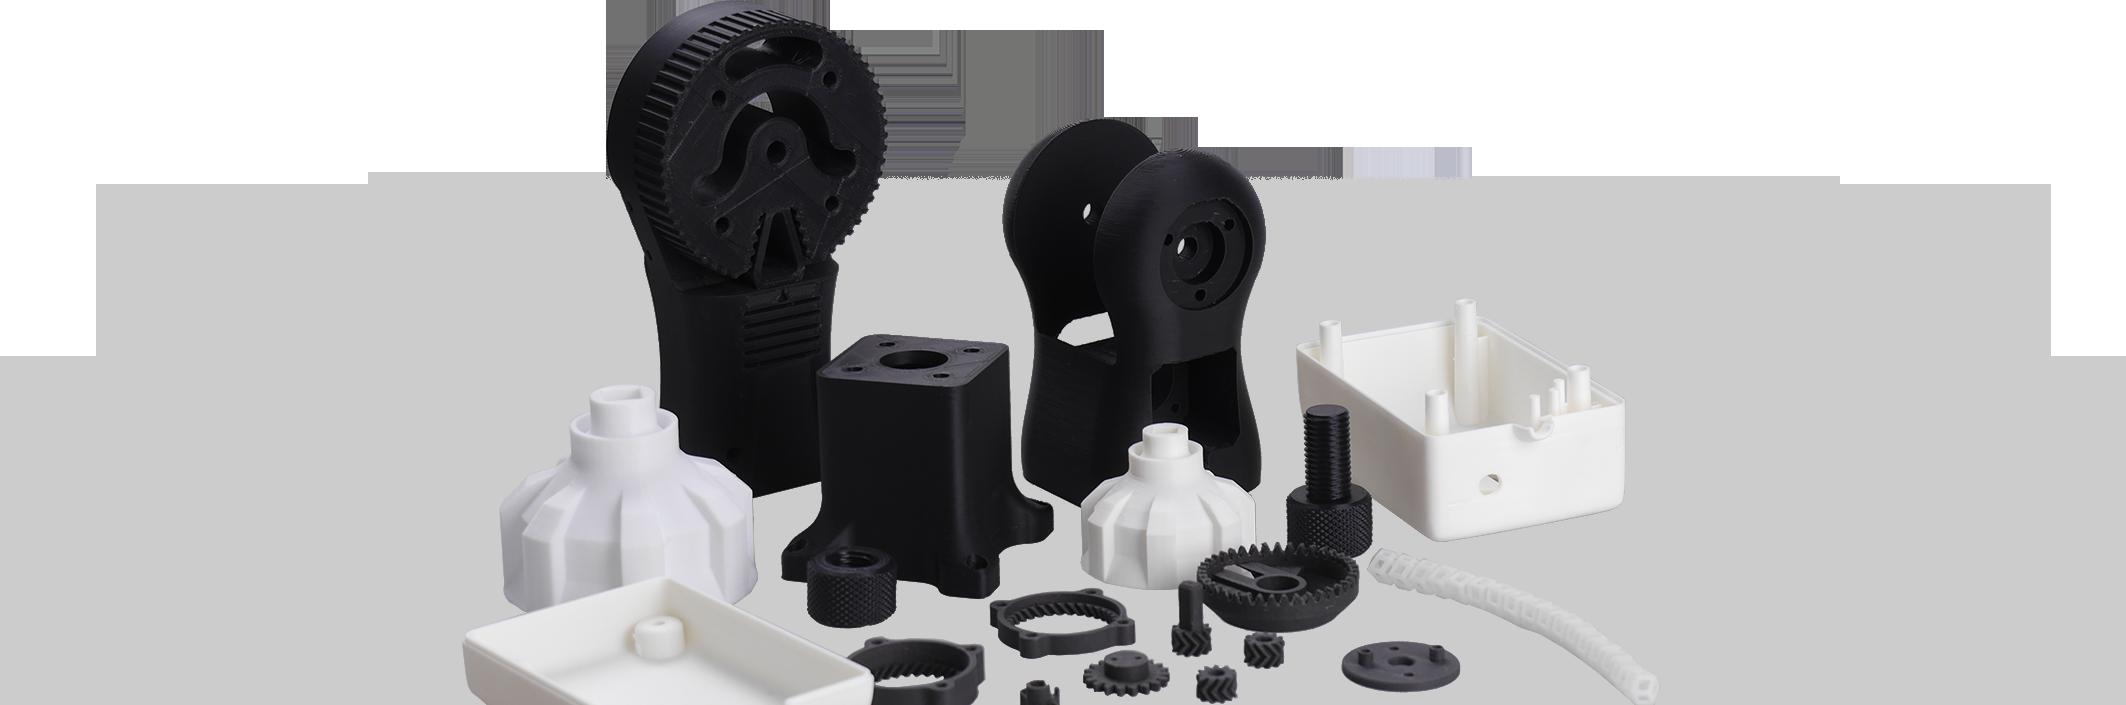 mankati,3D打印,3D打印材料,3D打印模型